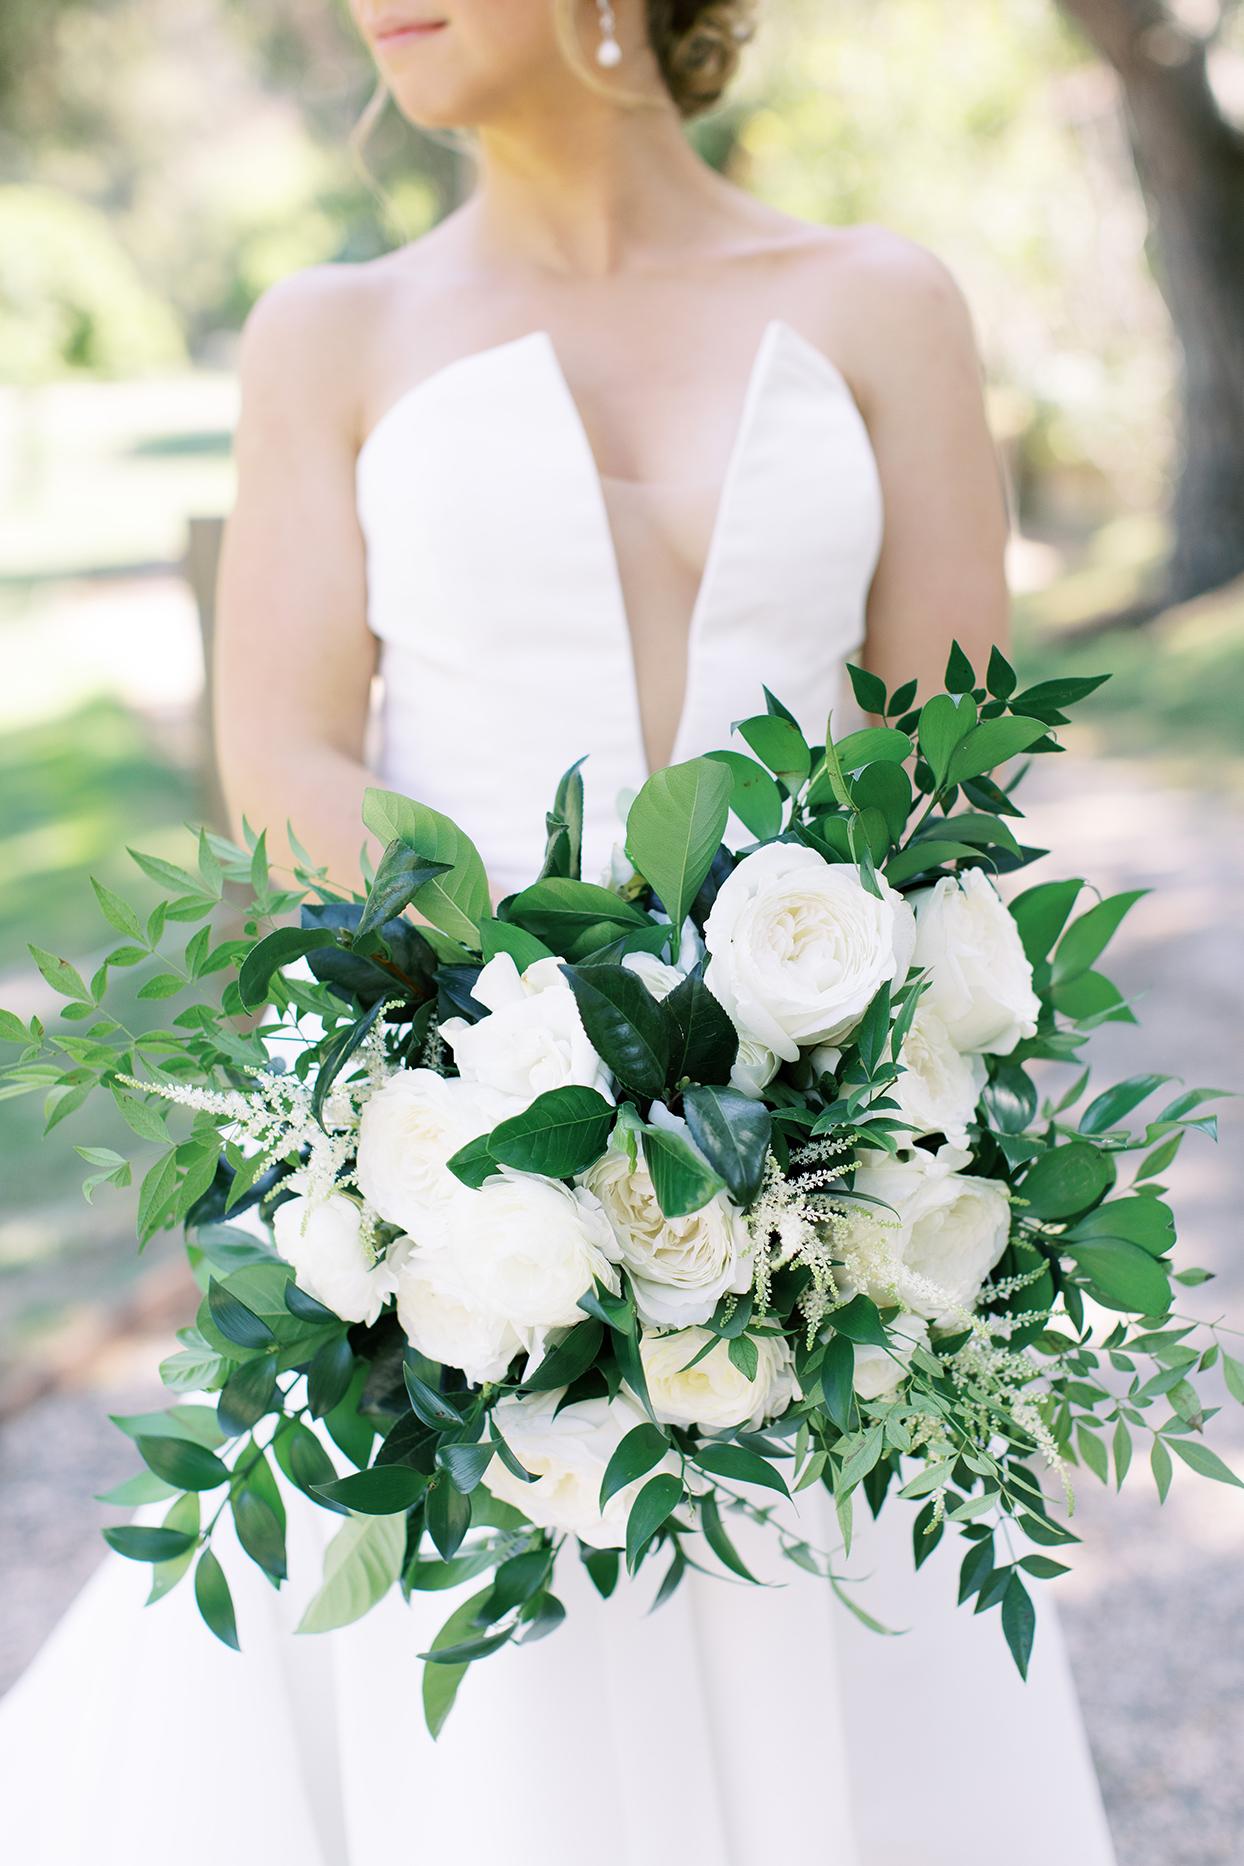 amanda will bride holding wedding bouquet